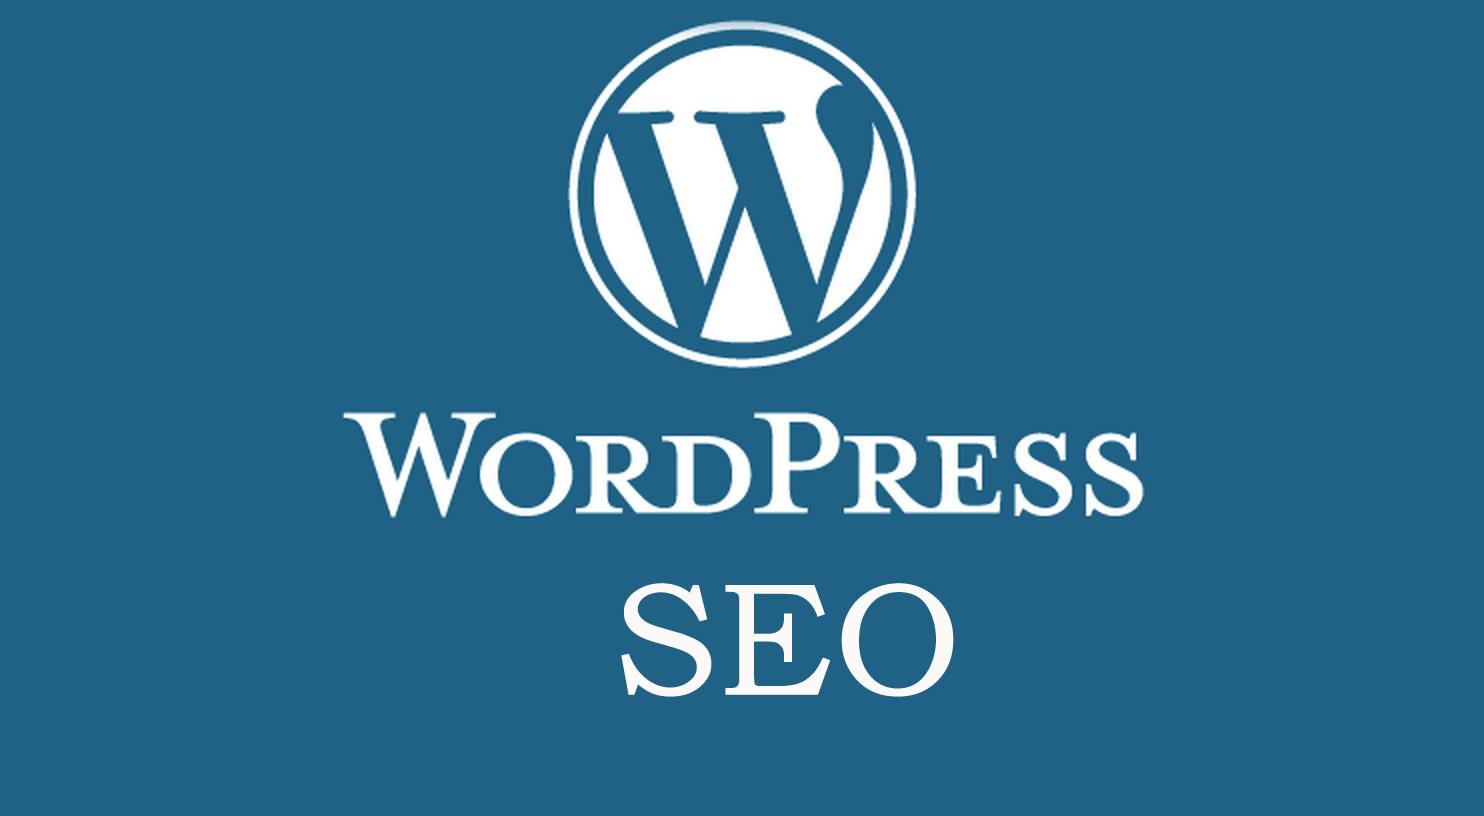 7 Great WordPress Plugins For Best Flexibility [2017]